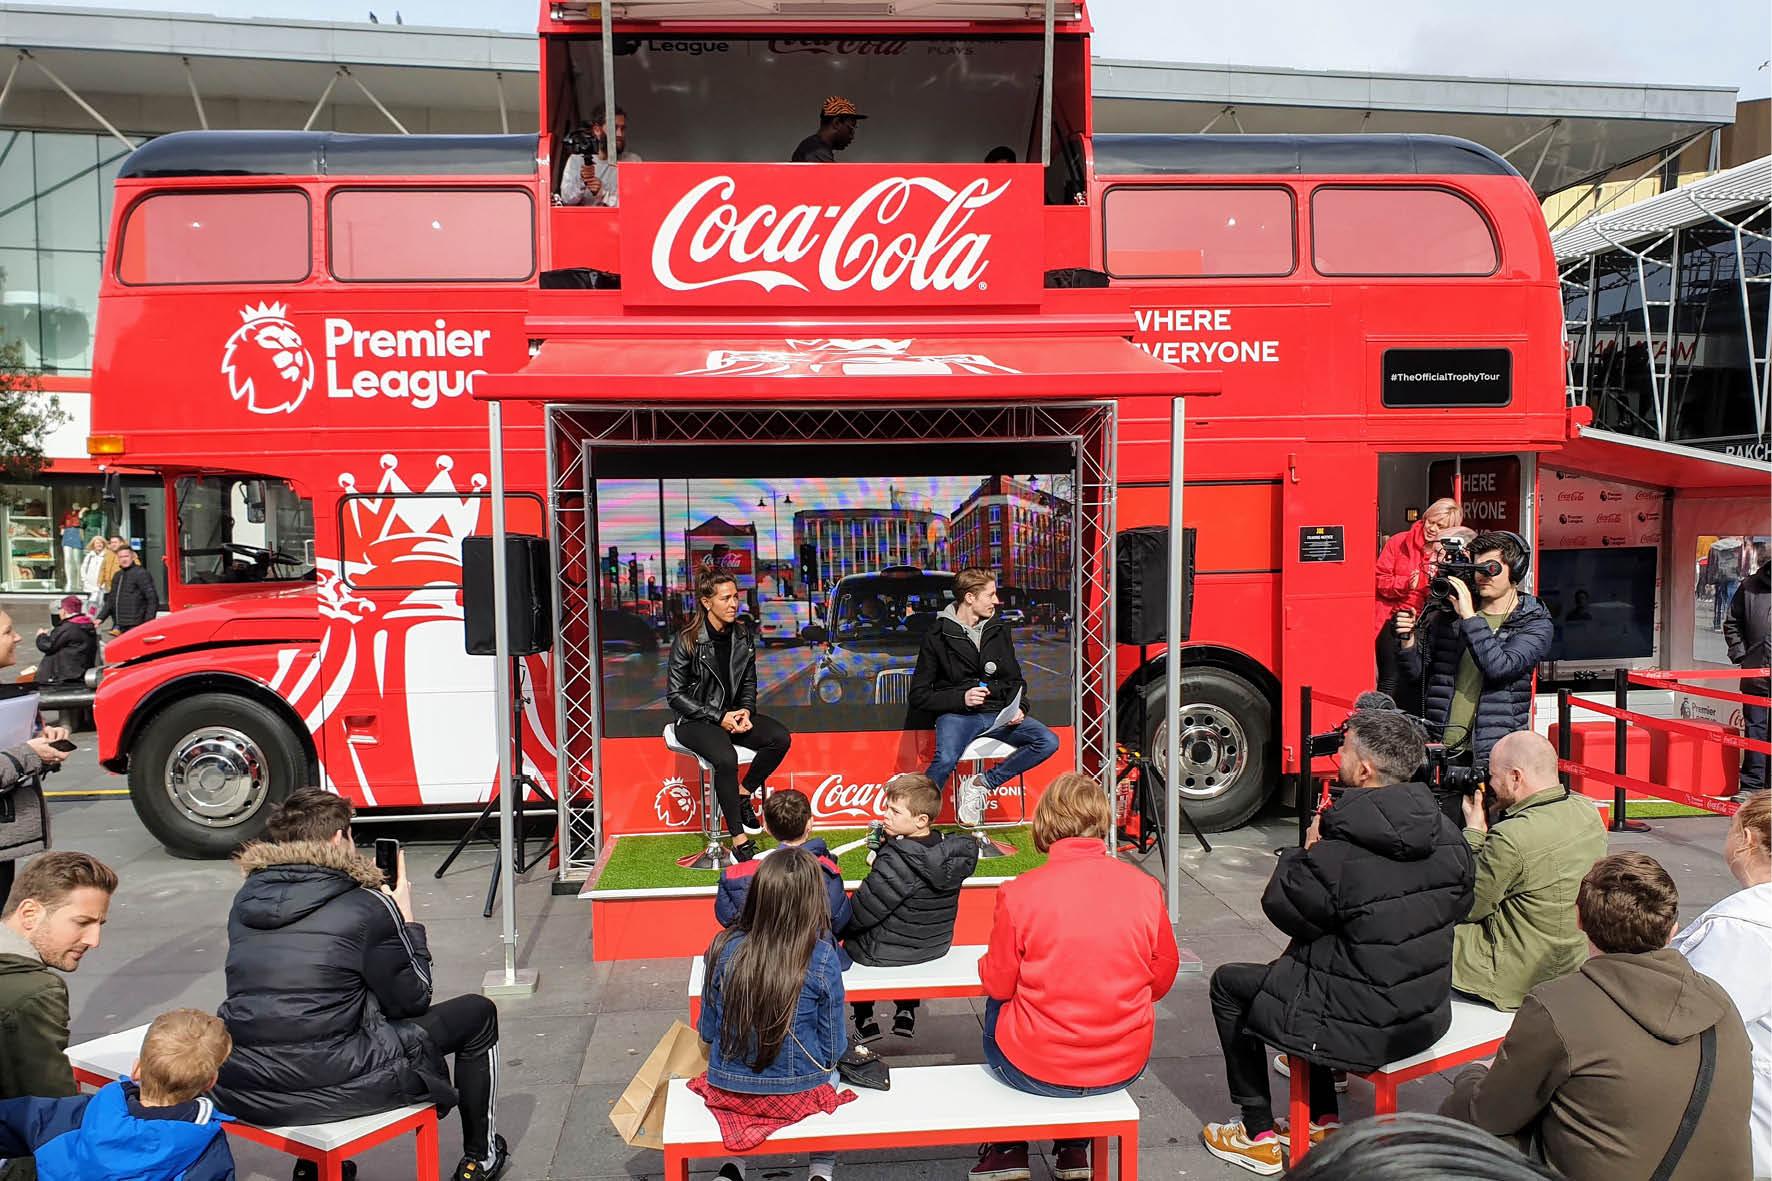 bus_business_2019_coca_cola_15.jpg